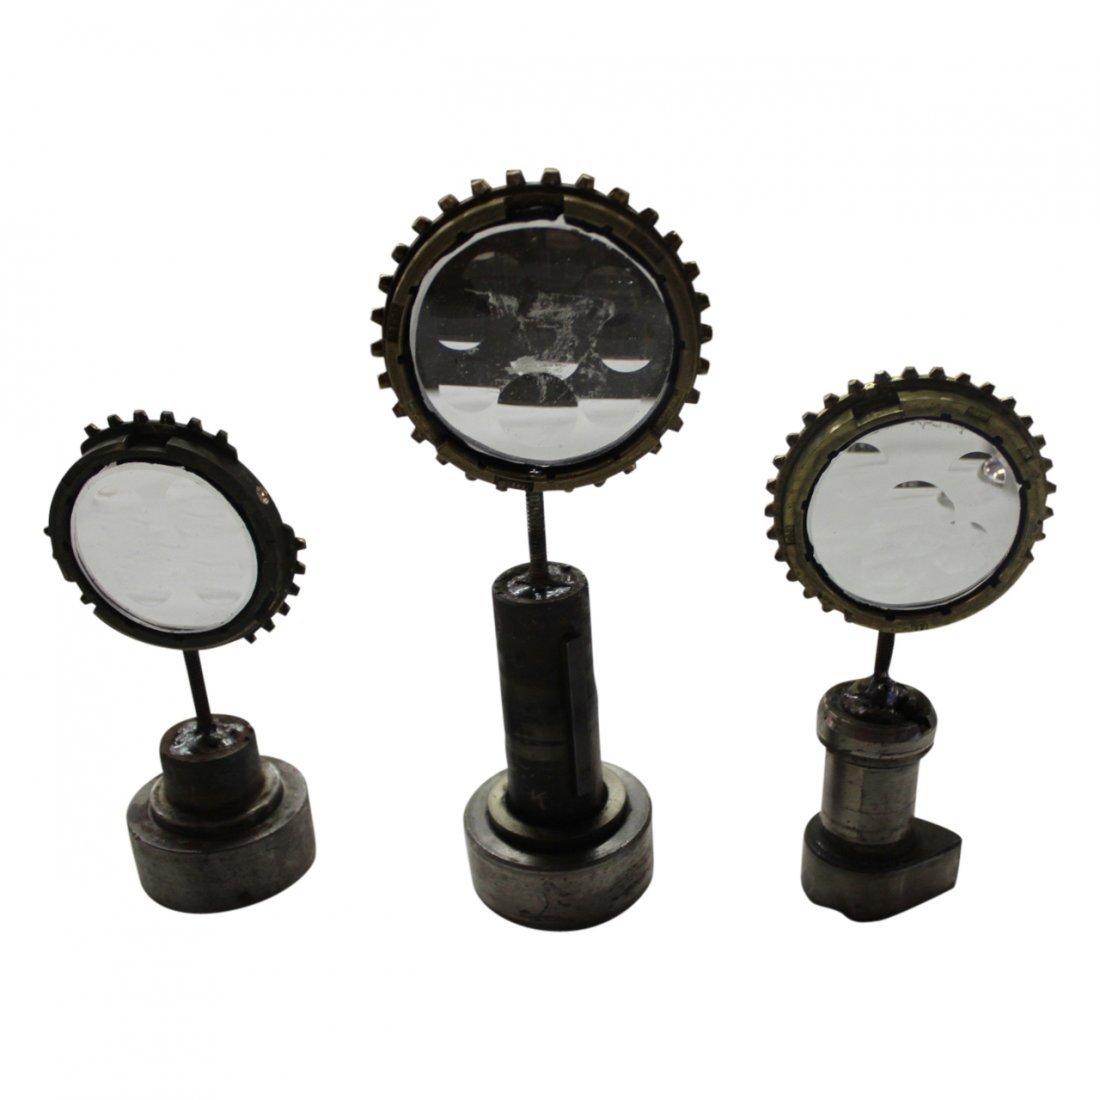 3 Feliciano Bejar Brass and Crystal Miniature Magiscope